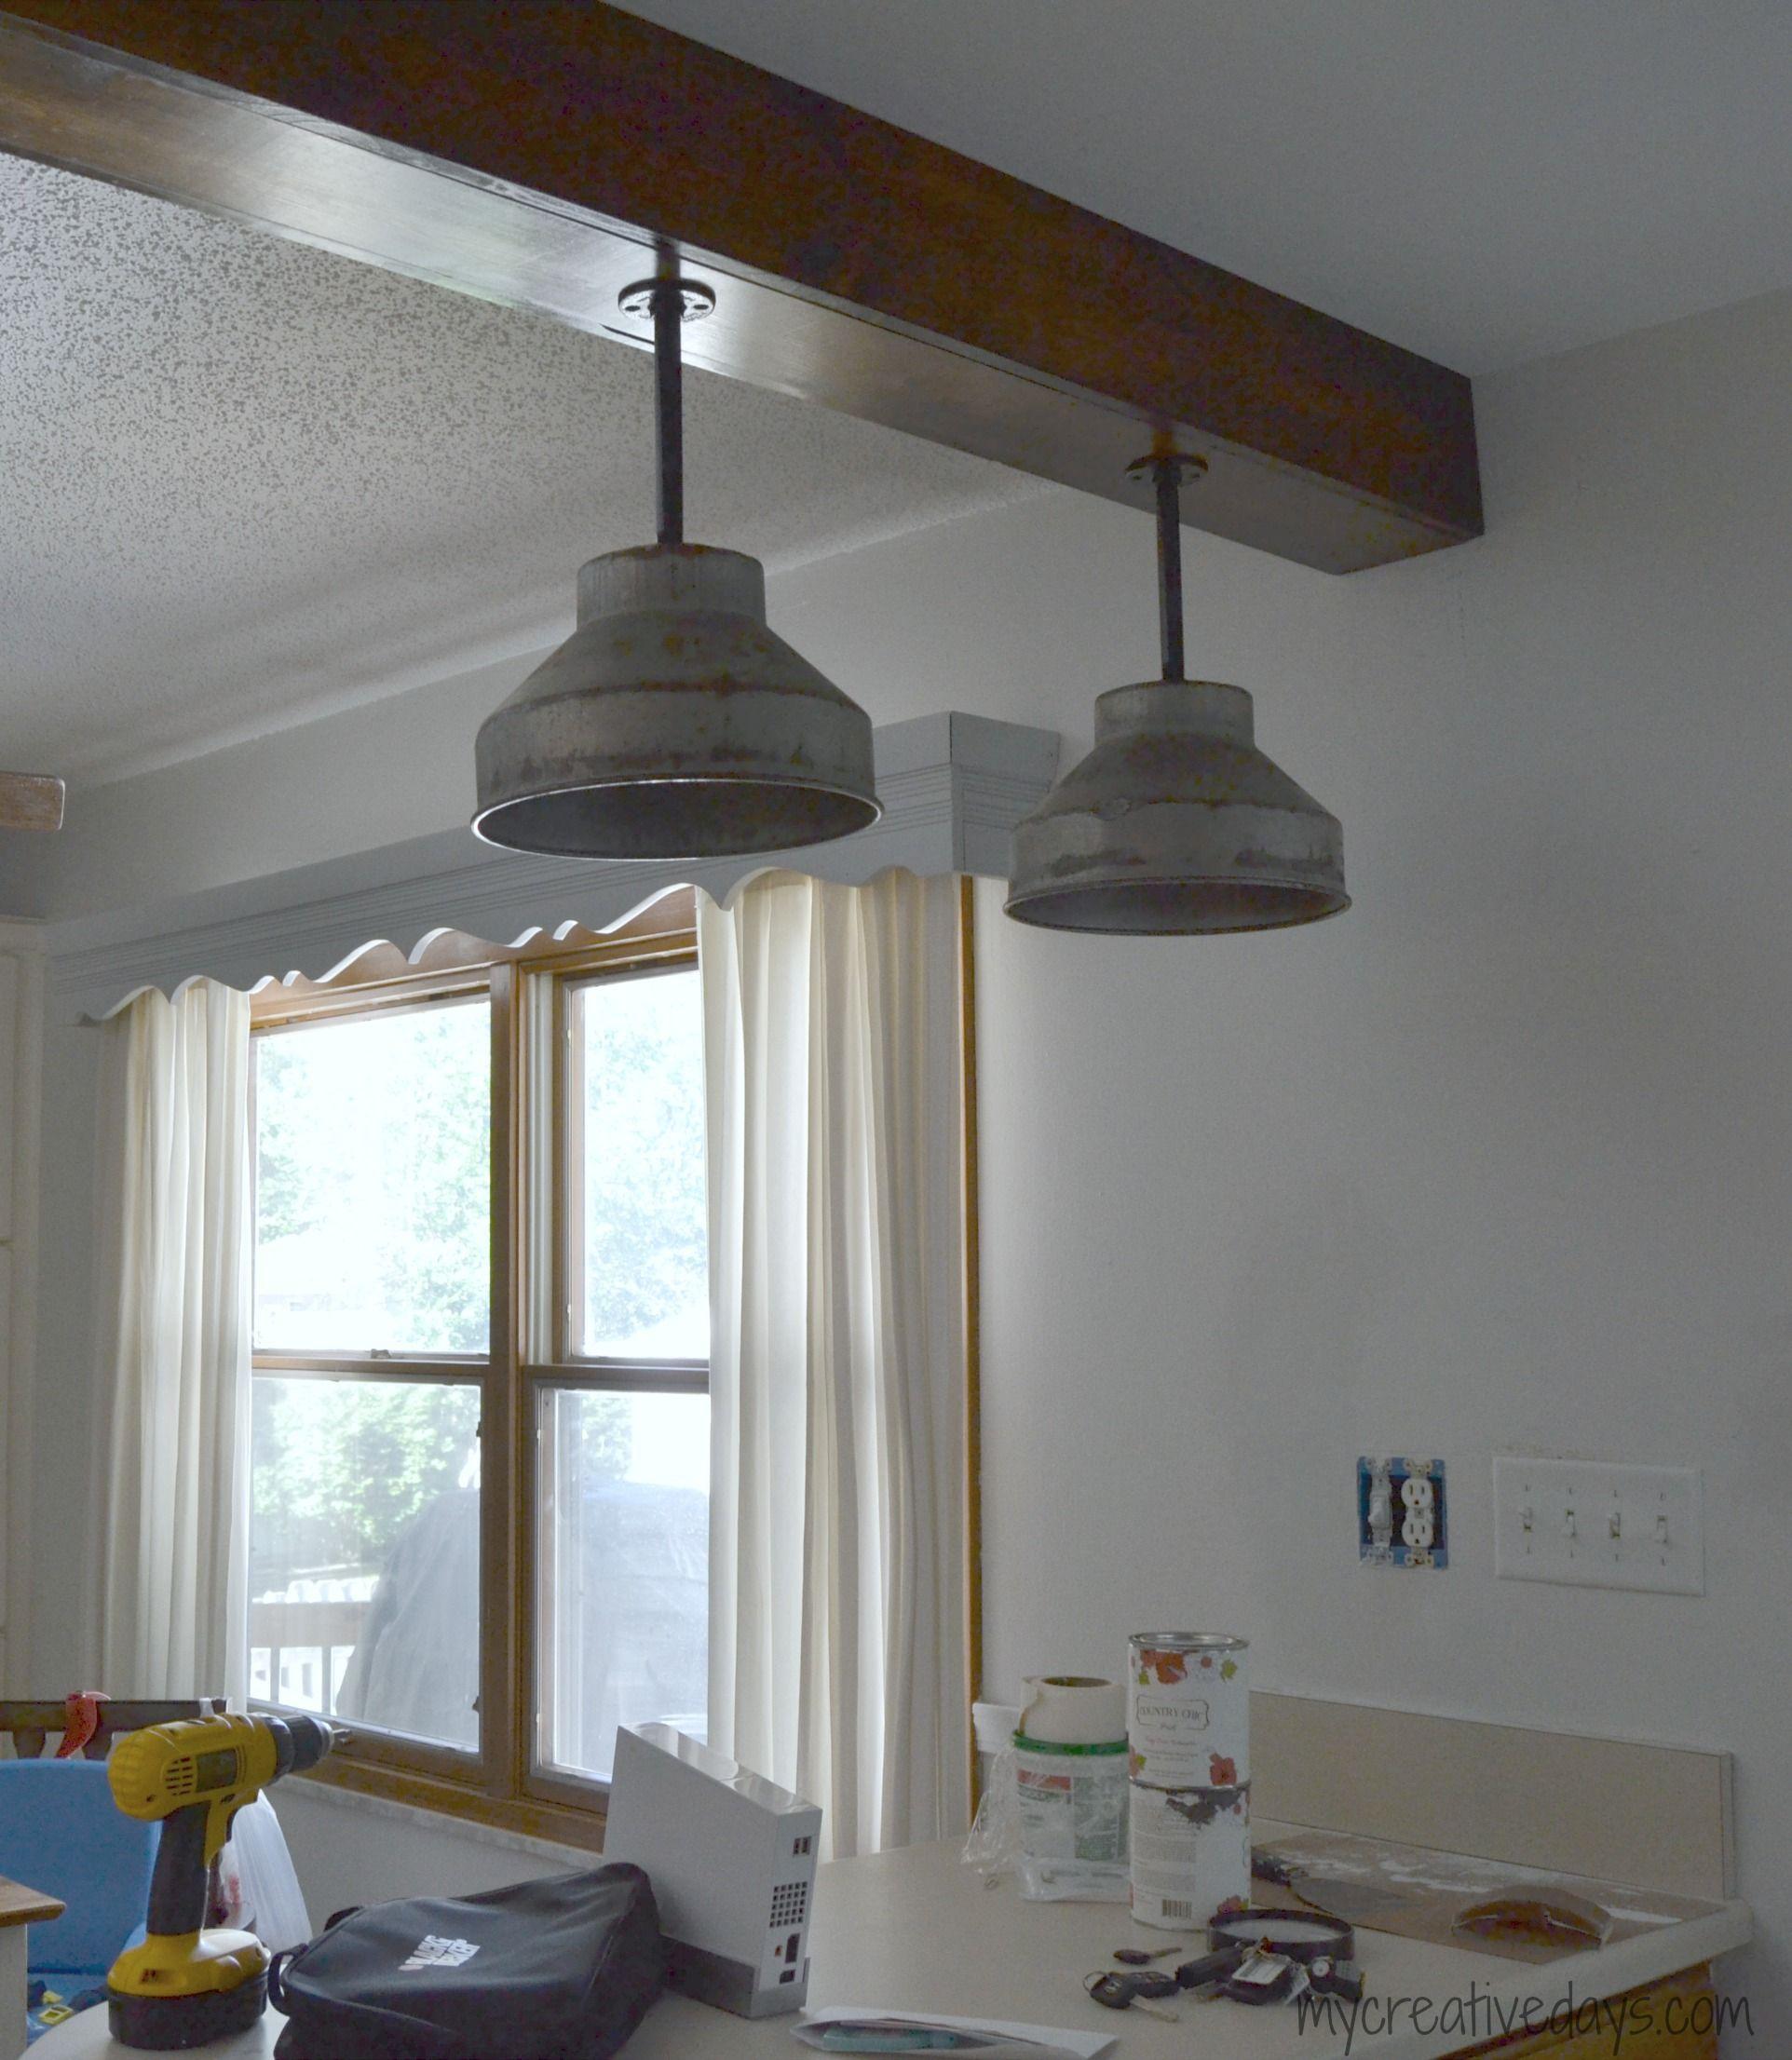 Kitchen Table Light Fixture Ideas: DIY Light Fixtures For The Kitchen